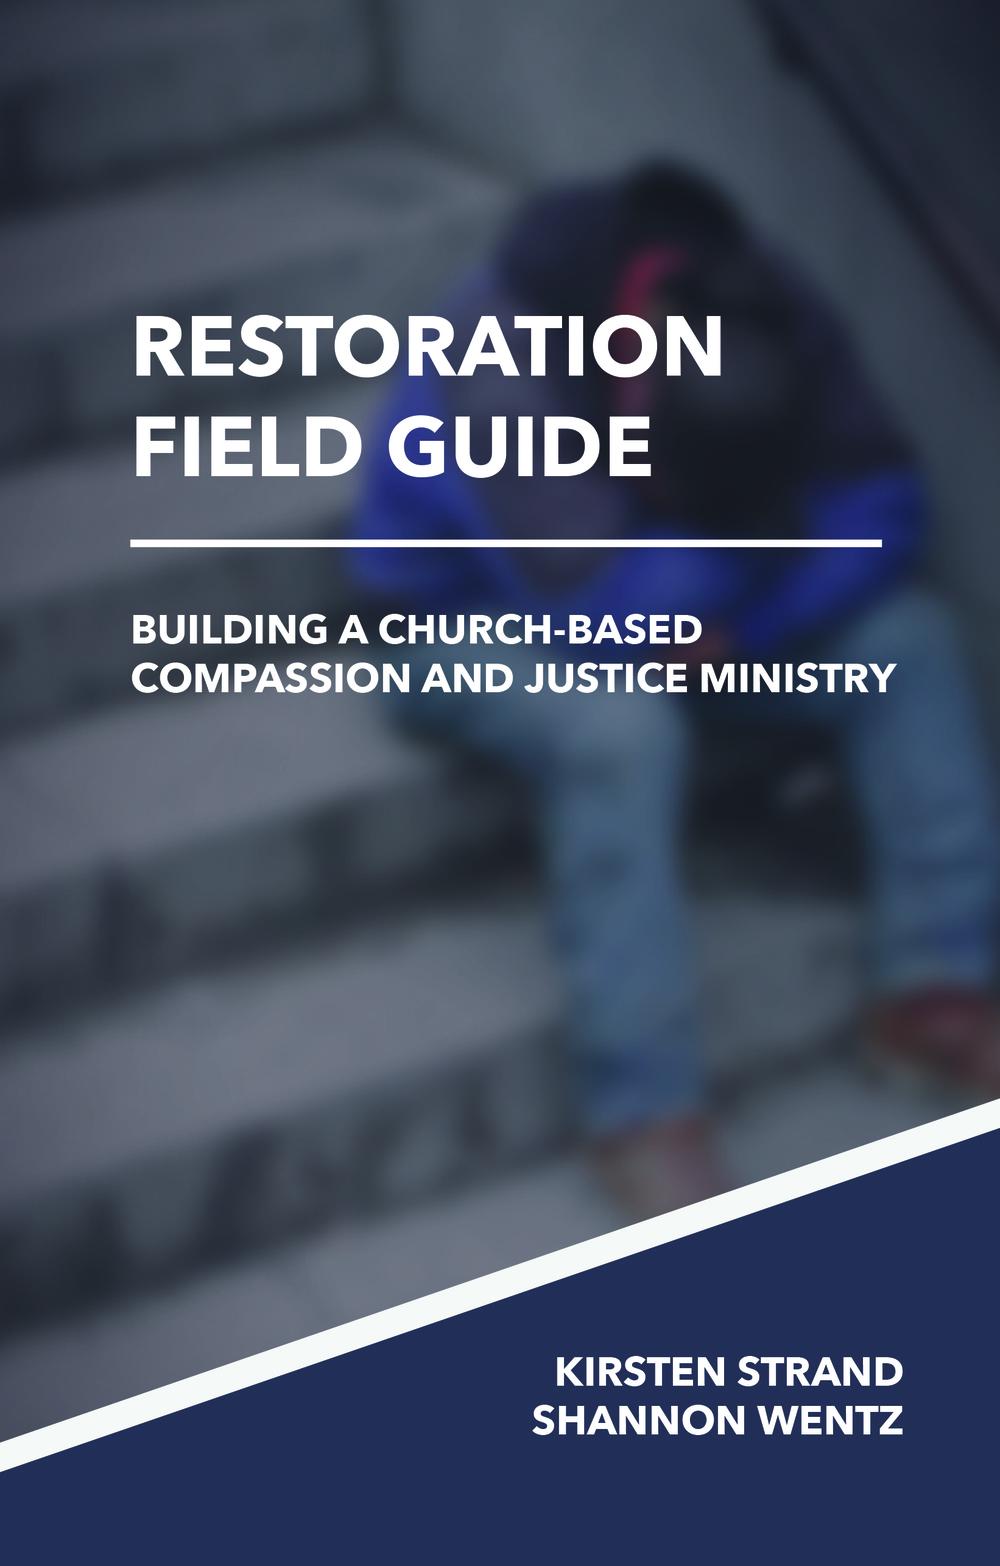 Restoration Field Guide